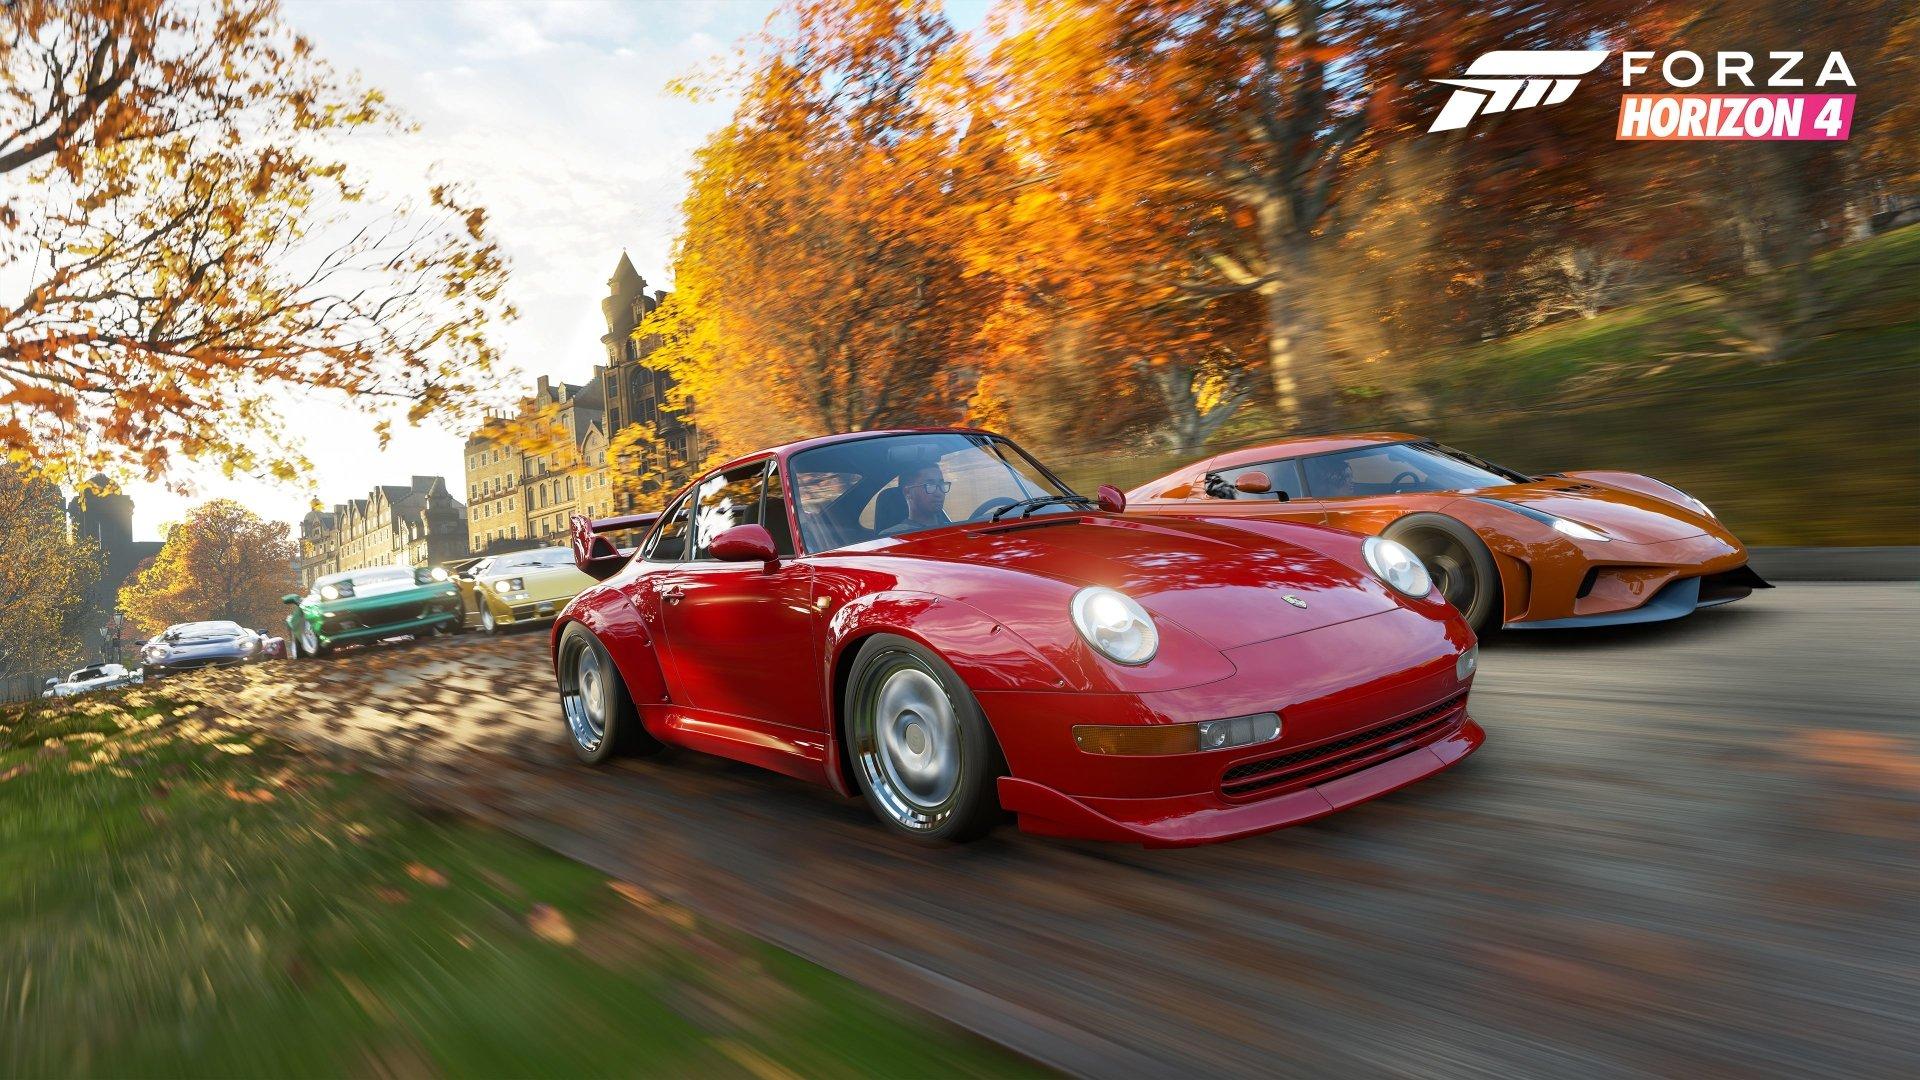 Forza Horizon 4 Wallpaper: Download Forza Horizon 4 HD Wallpapers